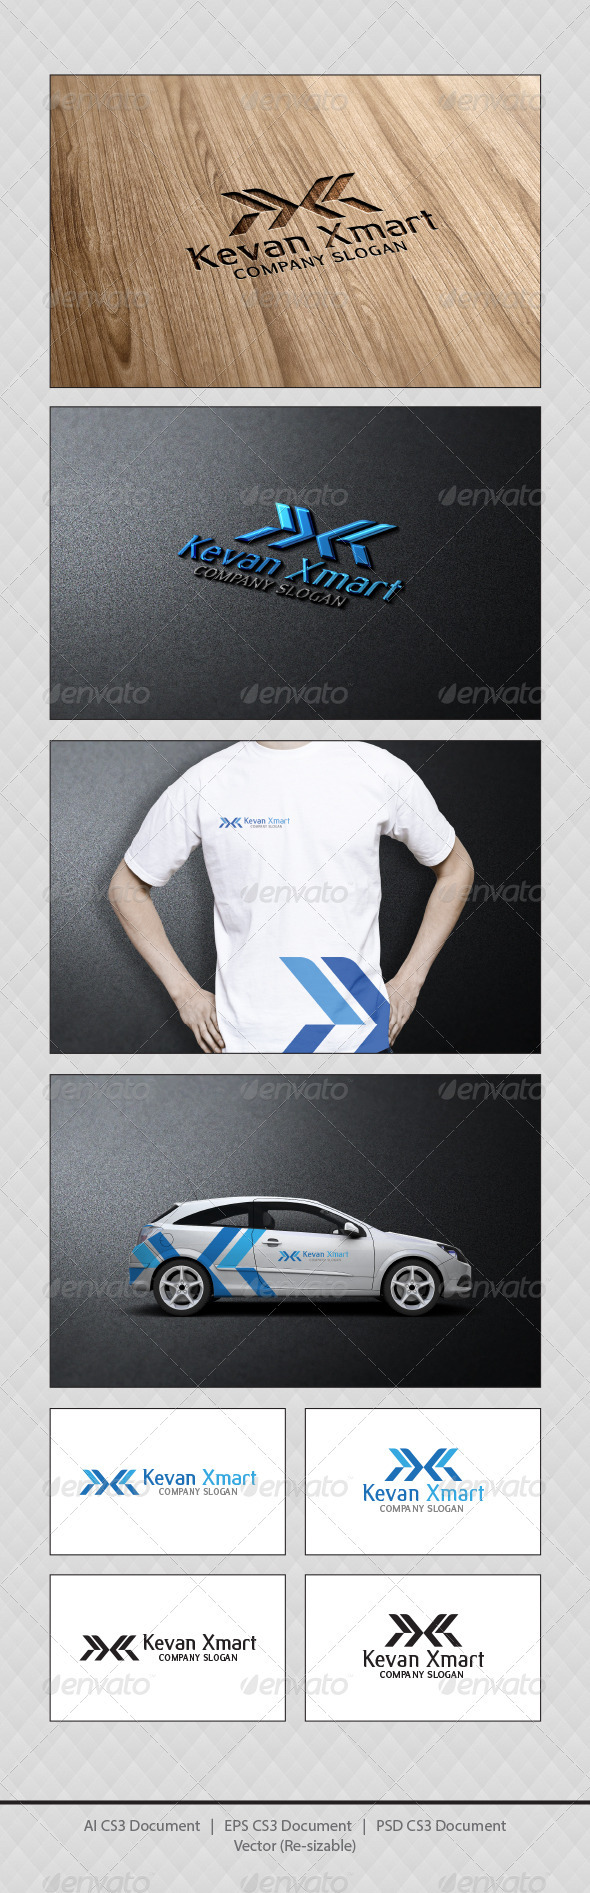 GraphicRiver Kevan Xmart Logo Templates 3704877